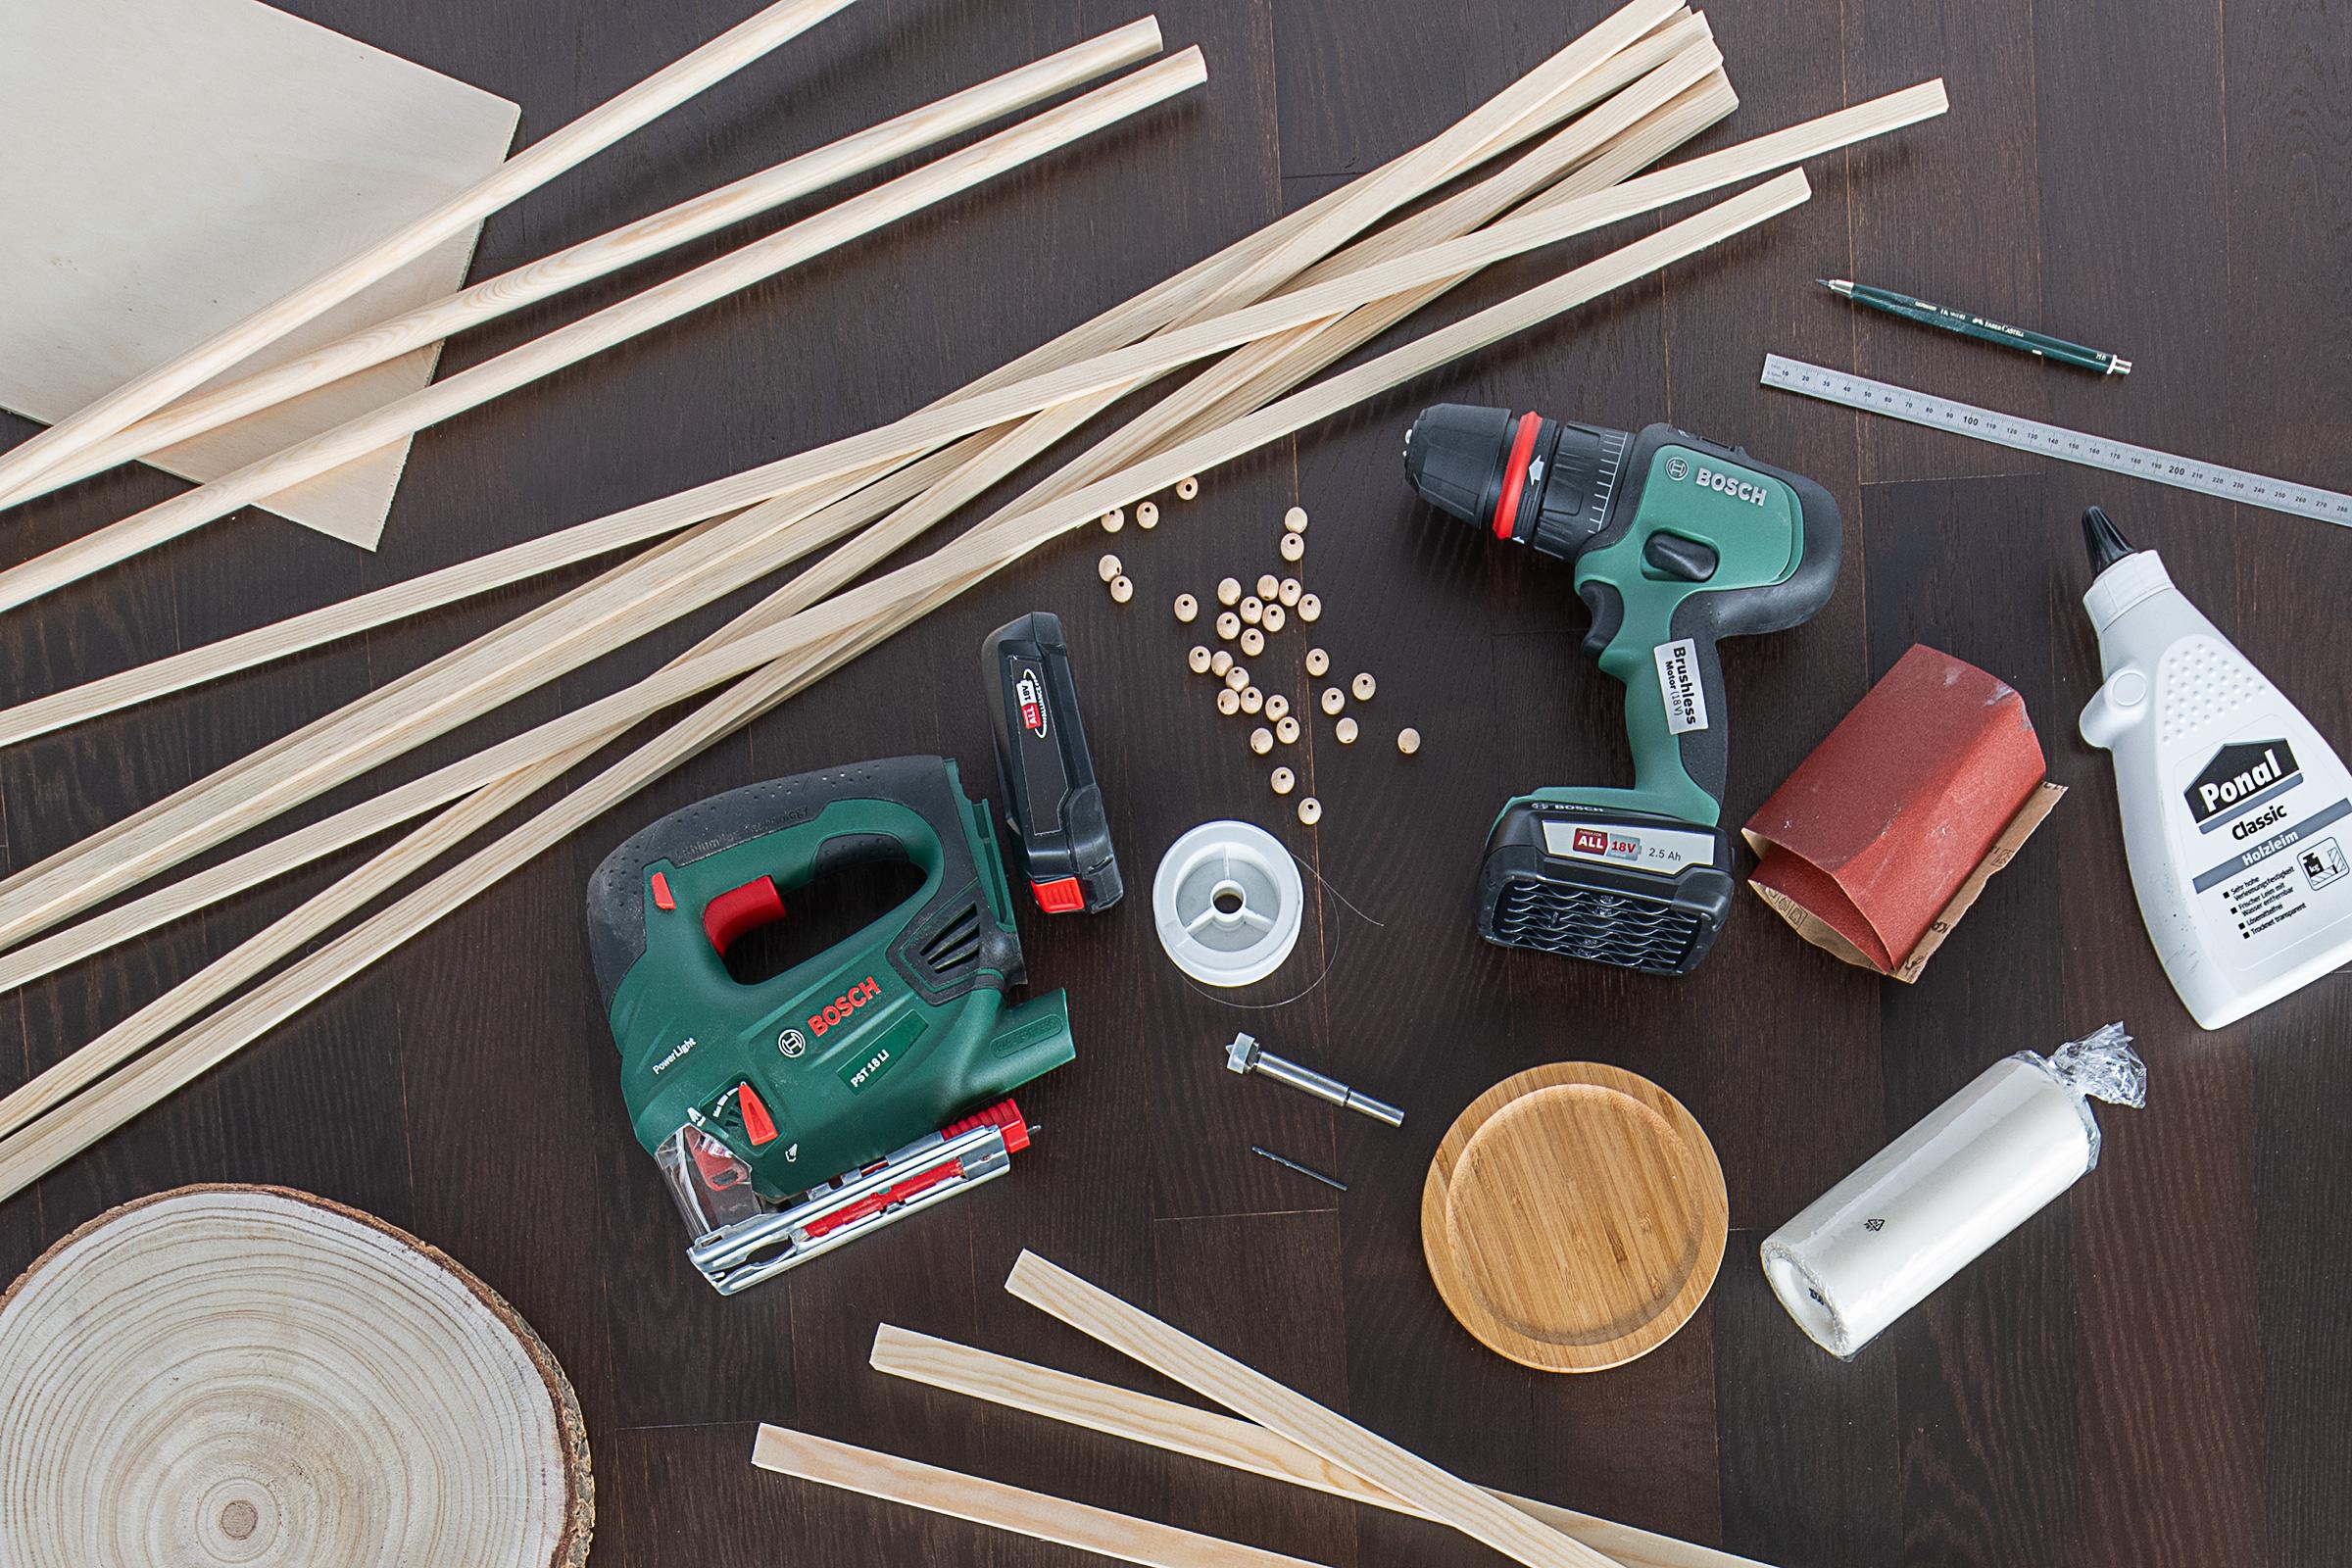 DIY Outdoor Lantern - Supplies